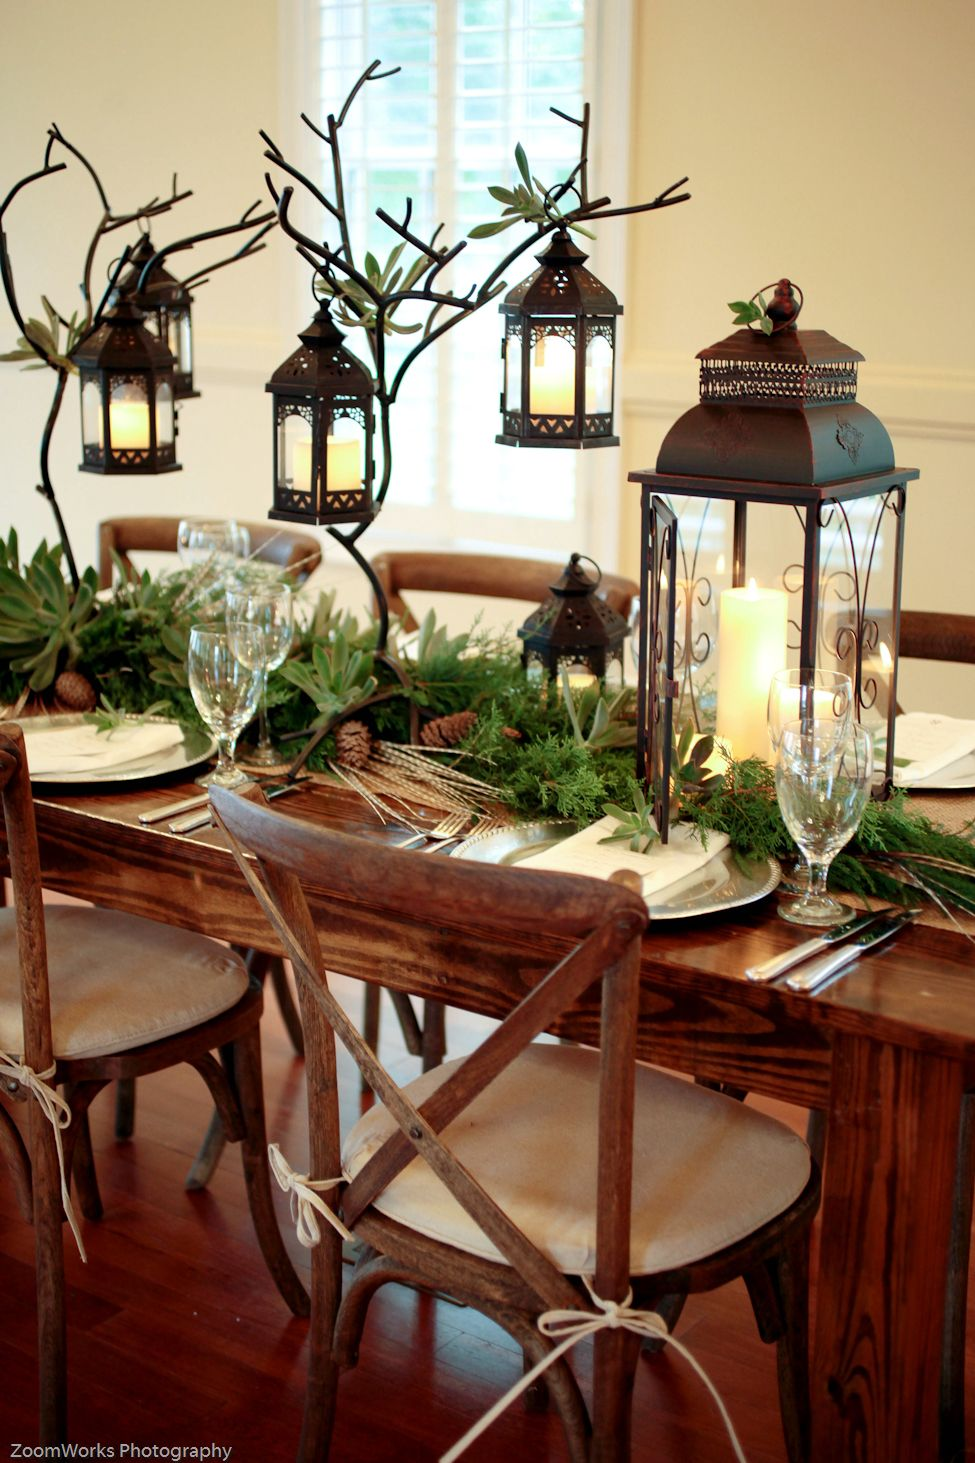 Christmas Tabledecor Lanterns Christmasdecorations Christmas Dining Room Table Christmas Table Settings Lanterns Decor